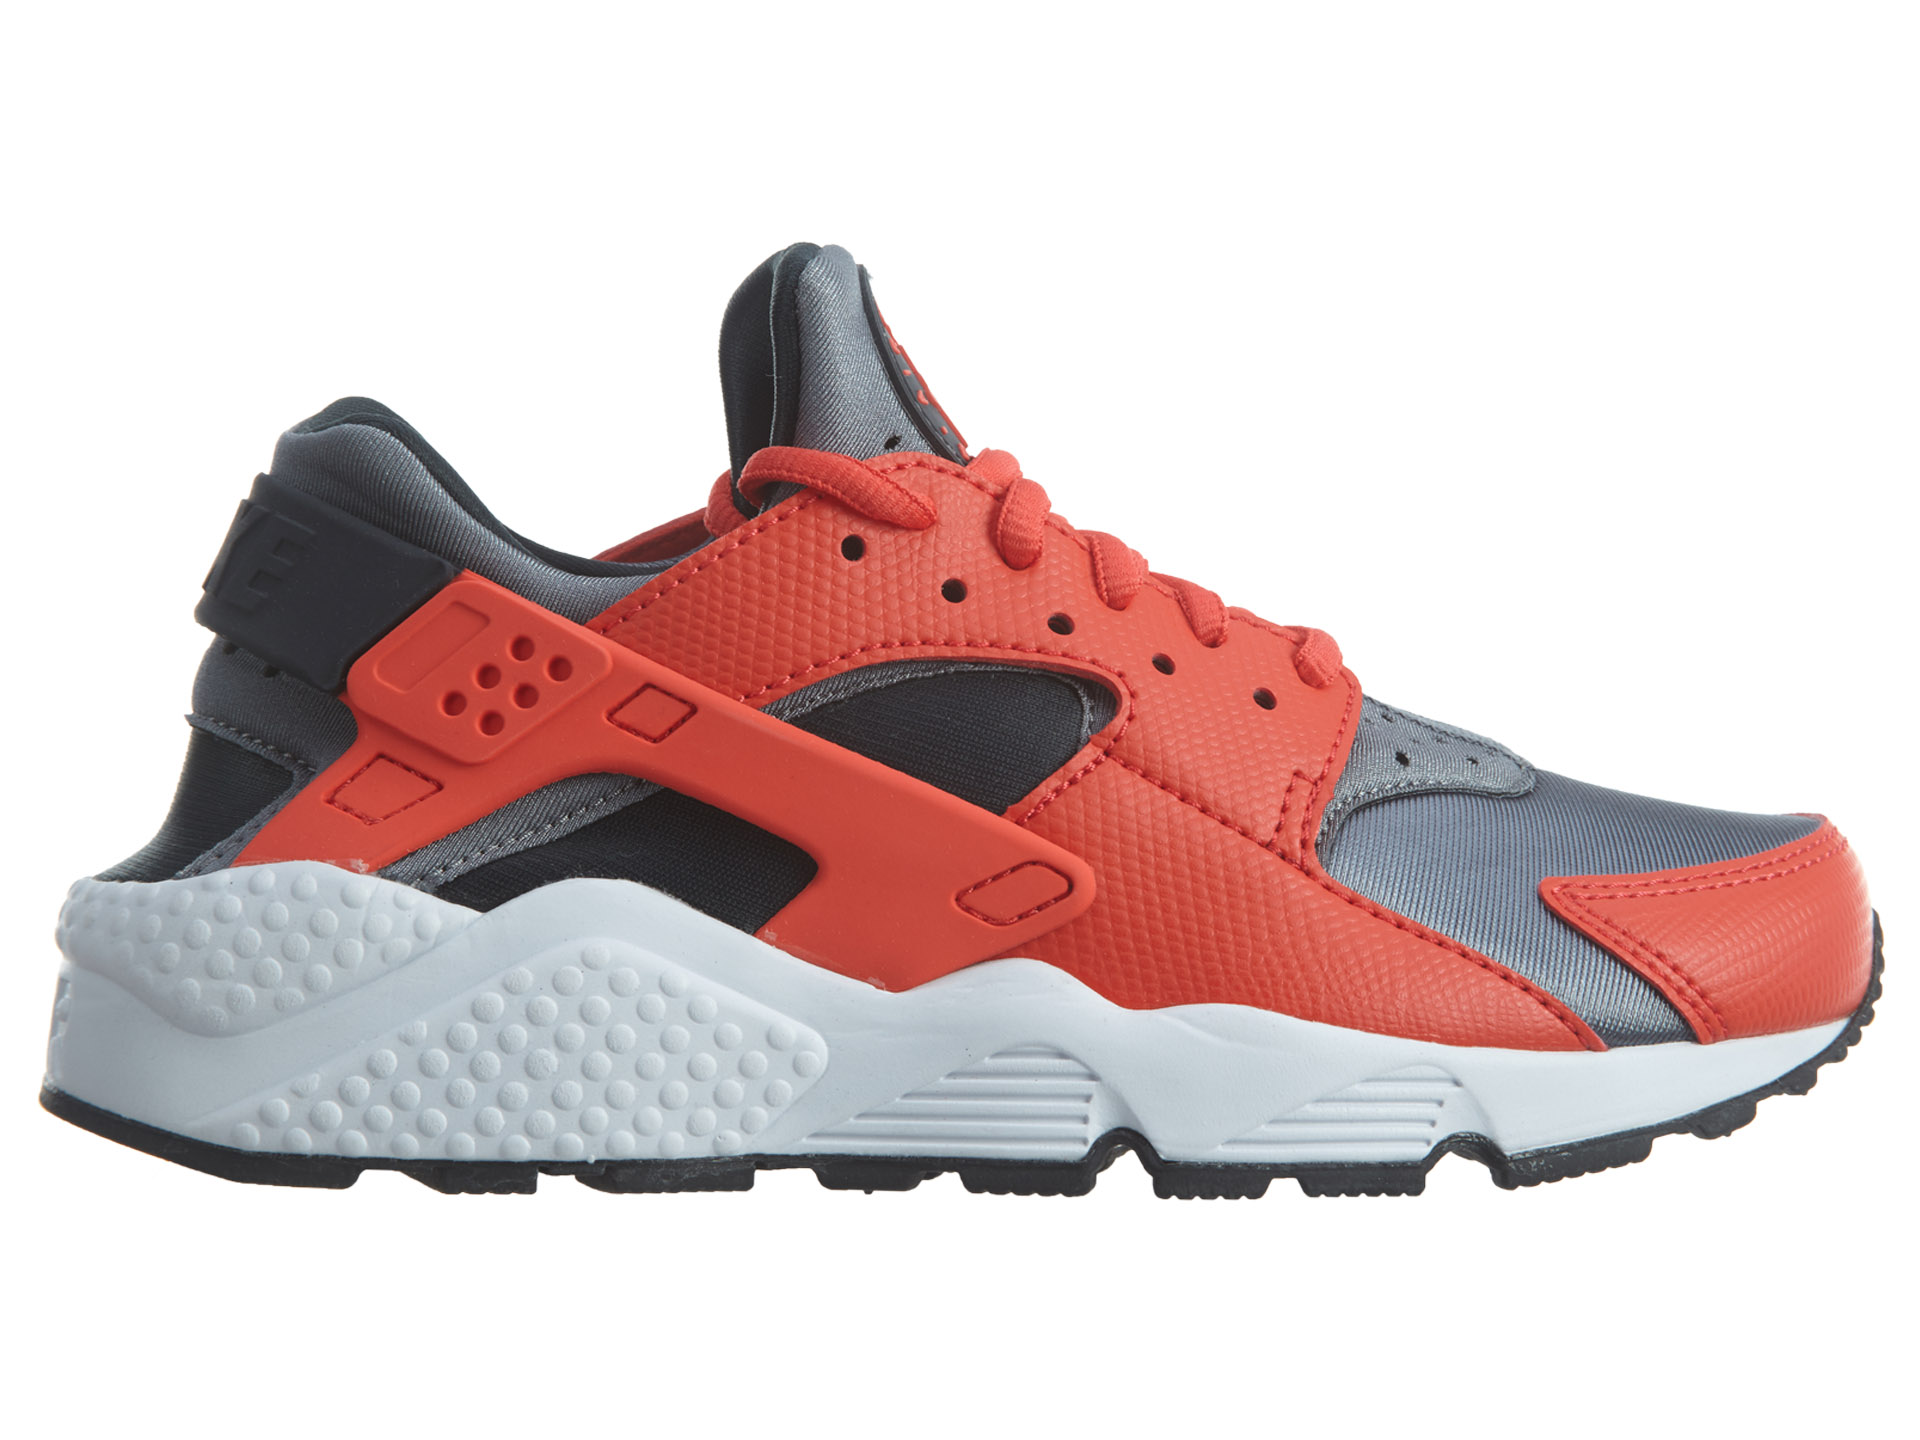 Nike Air Huarache Run Max Orange Cool Grey (W)